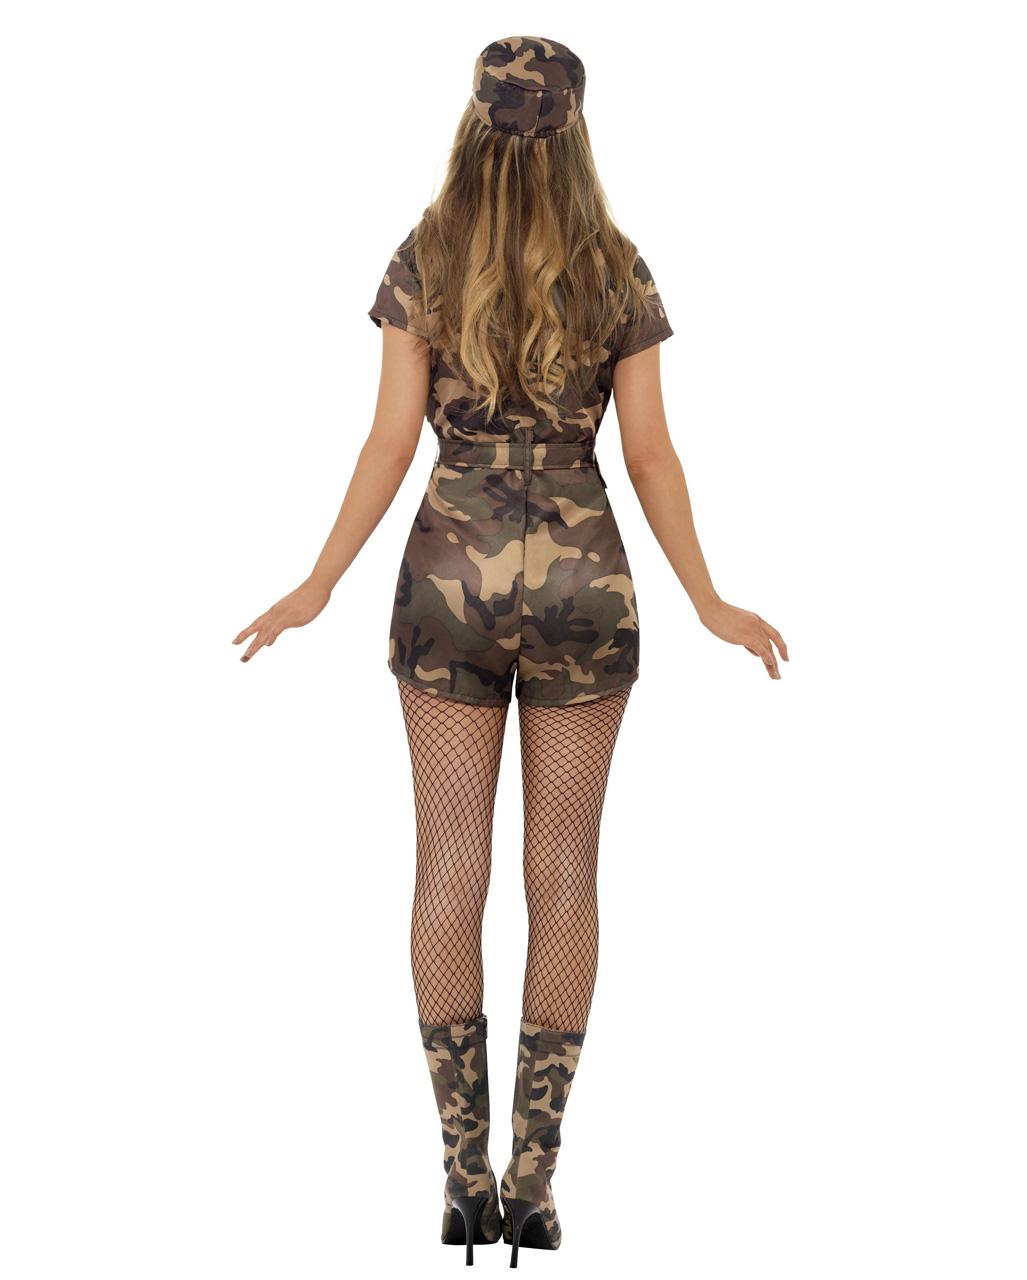 hot girls sexy mit shorts